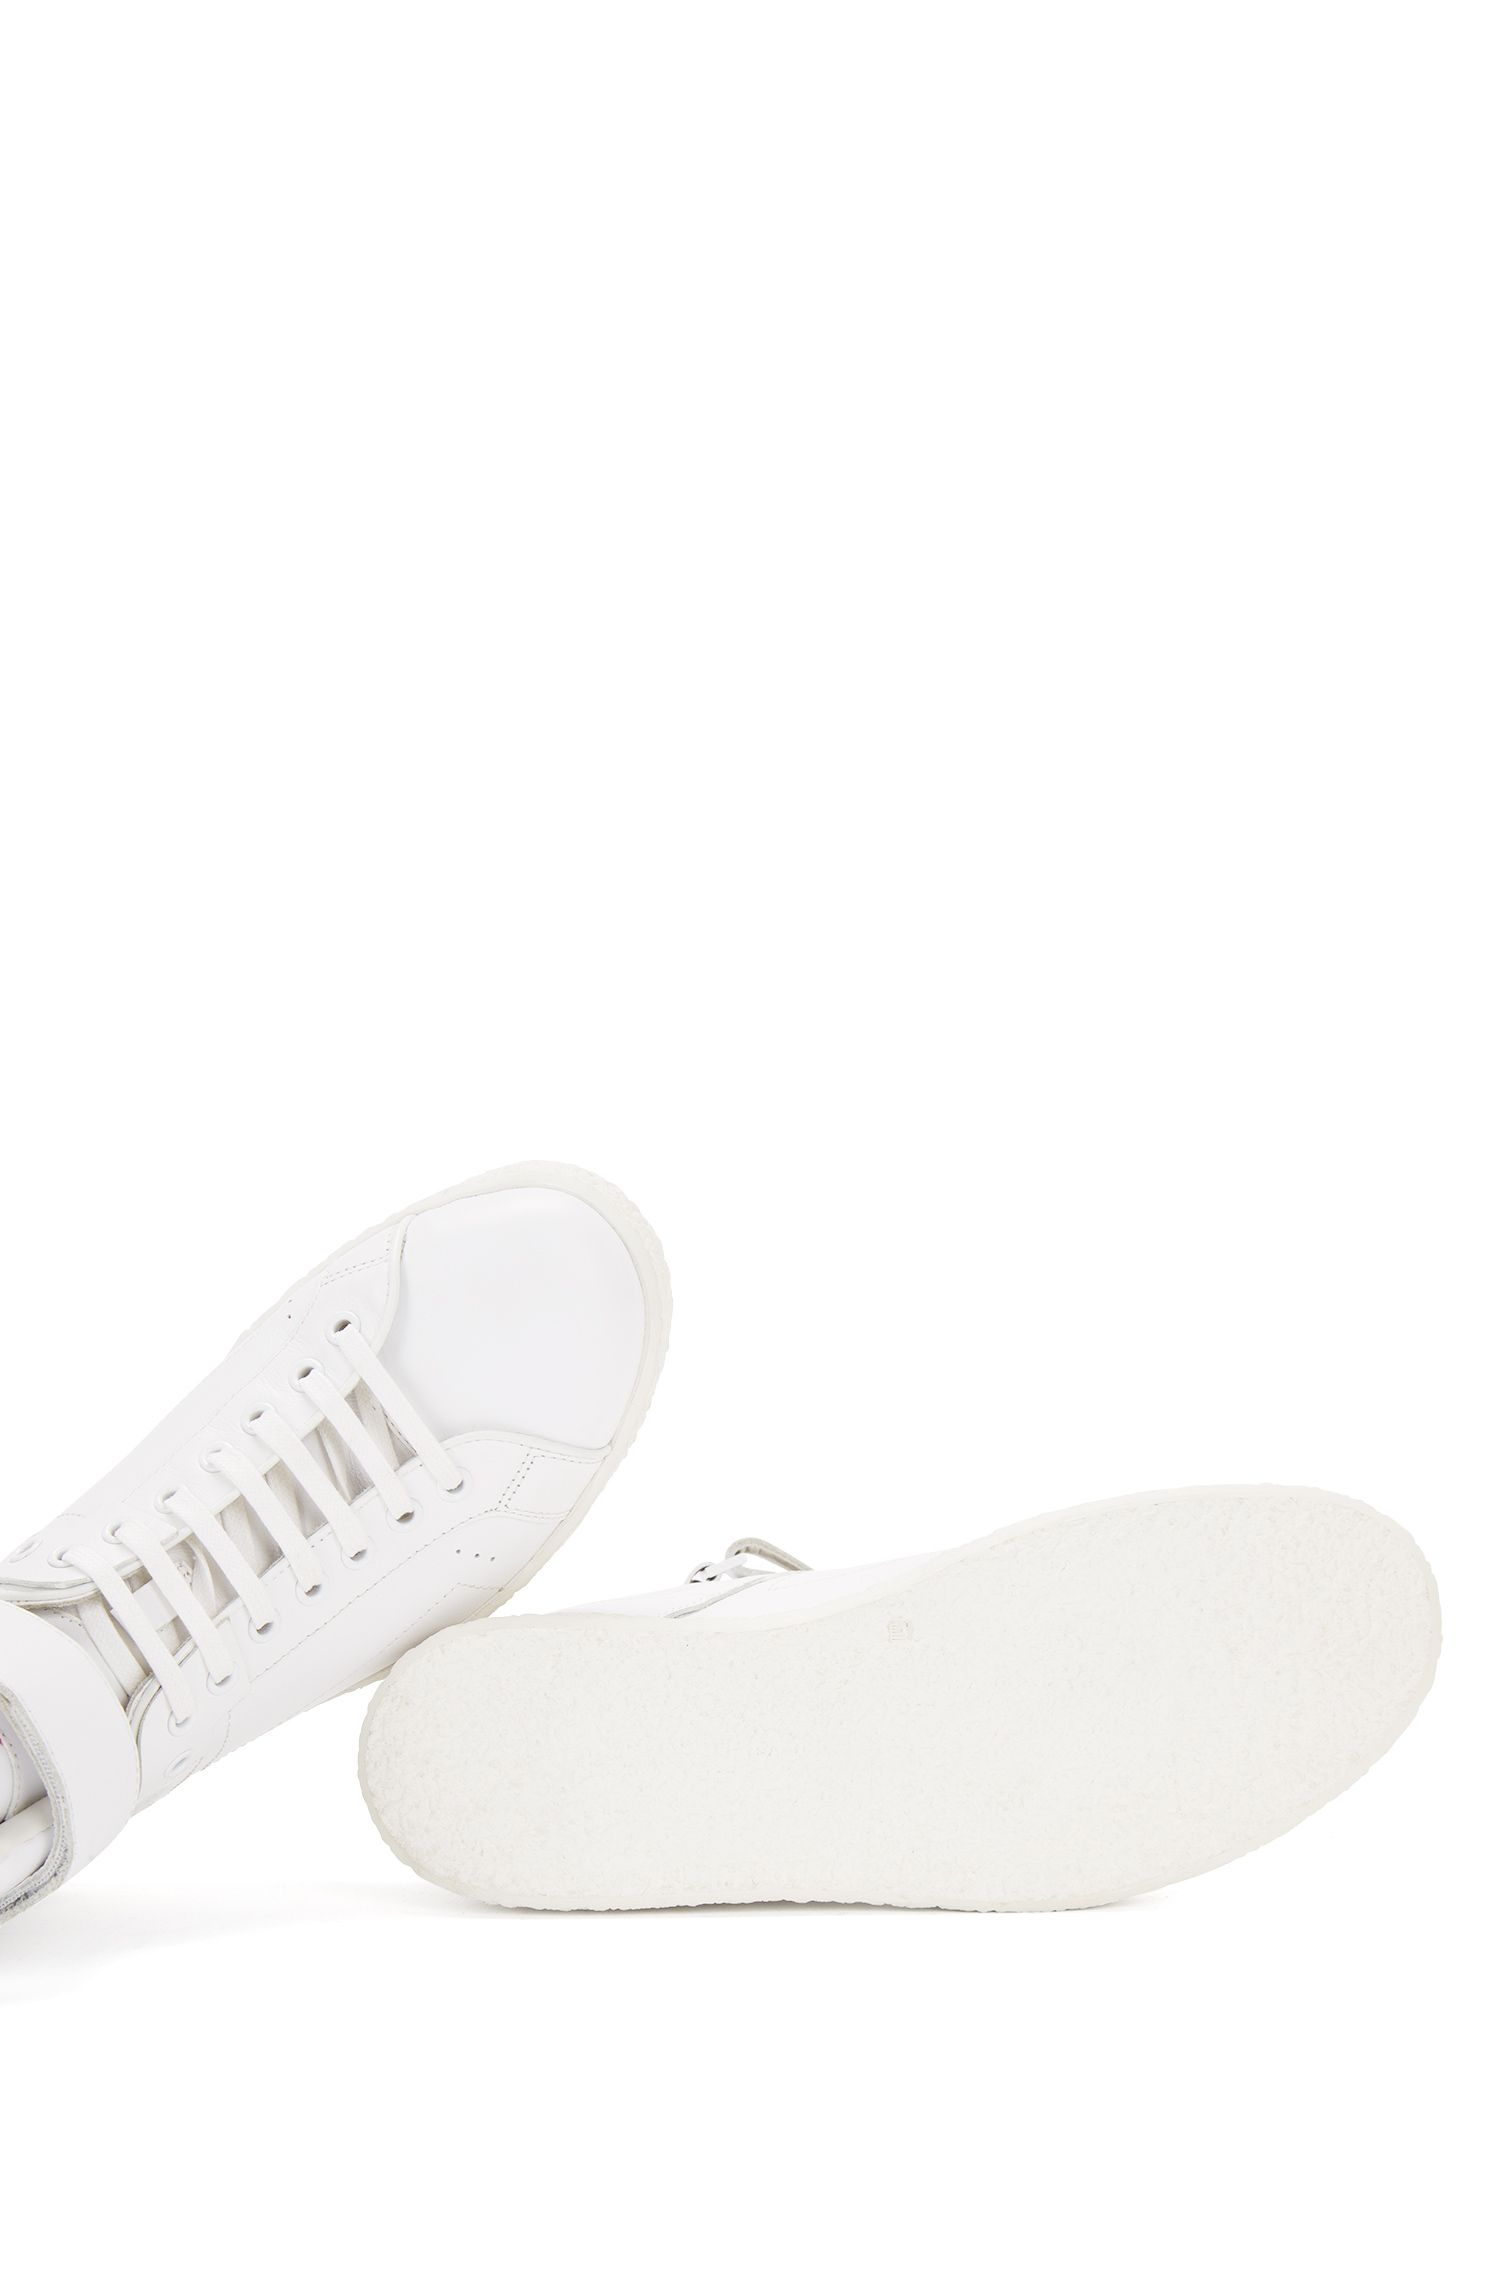 Sneakers aus Leder mit Klettverschluss: 'Cadeen-Crepe'